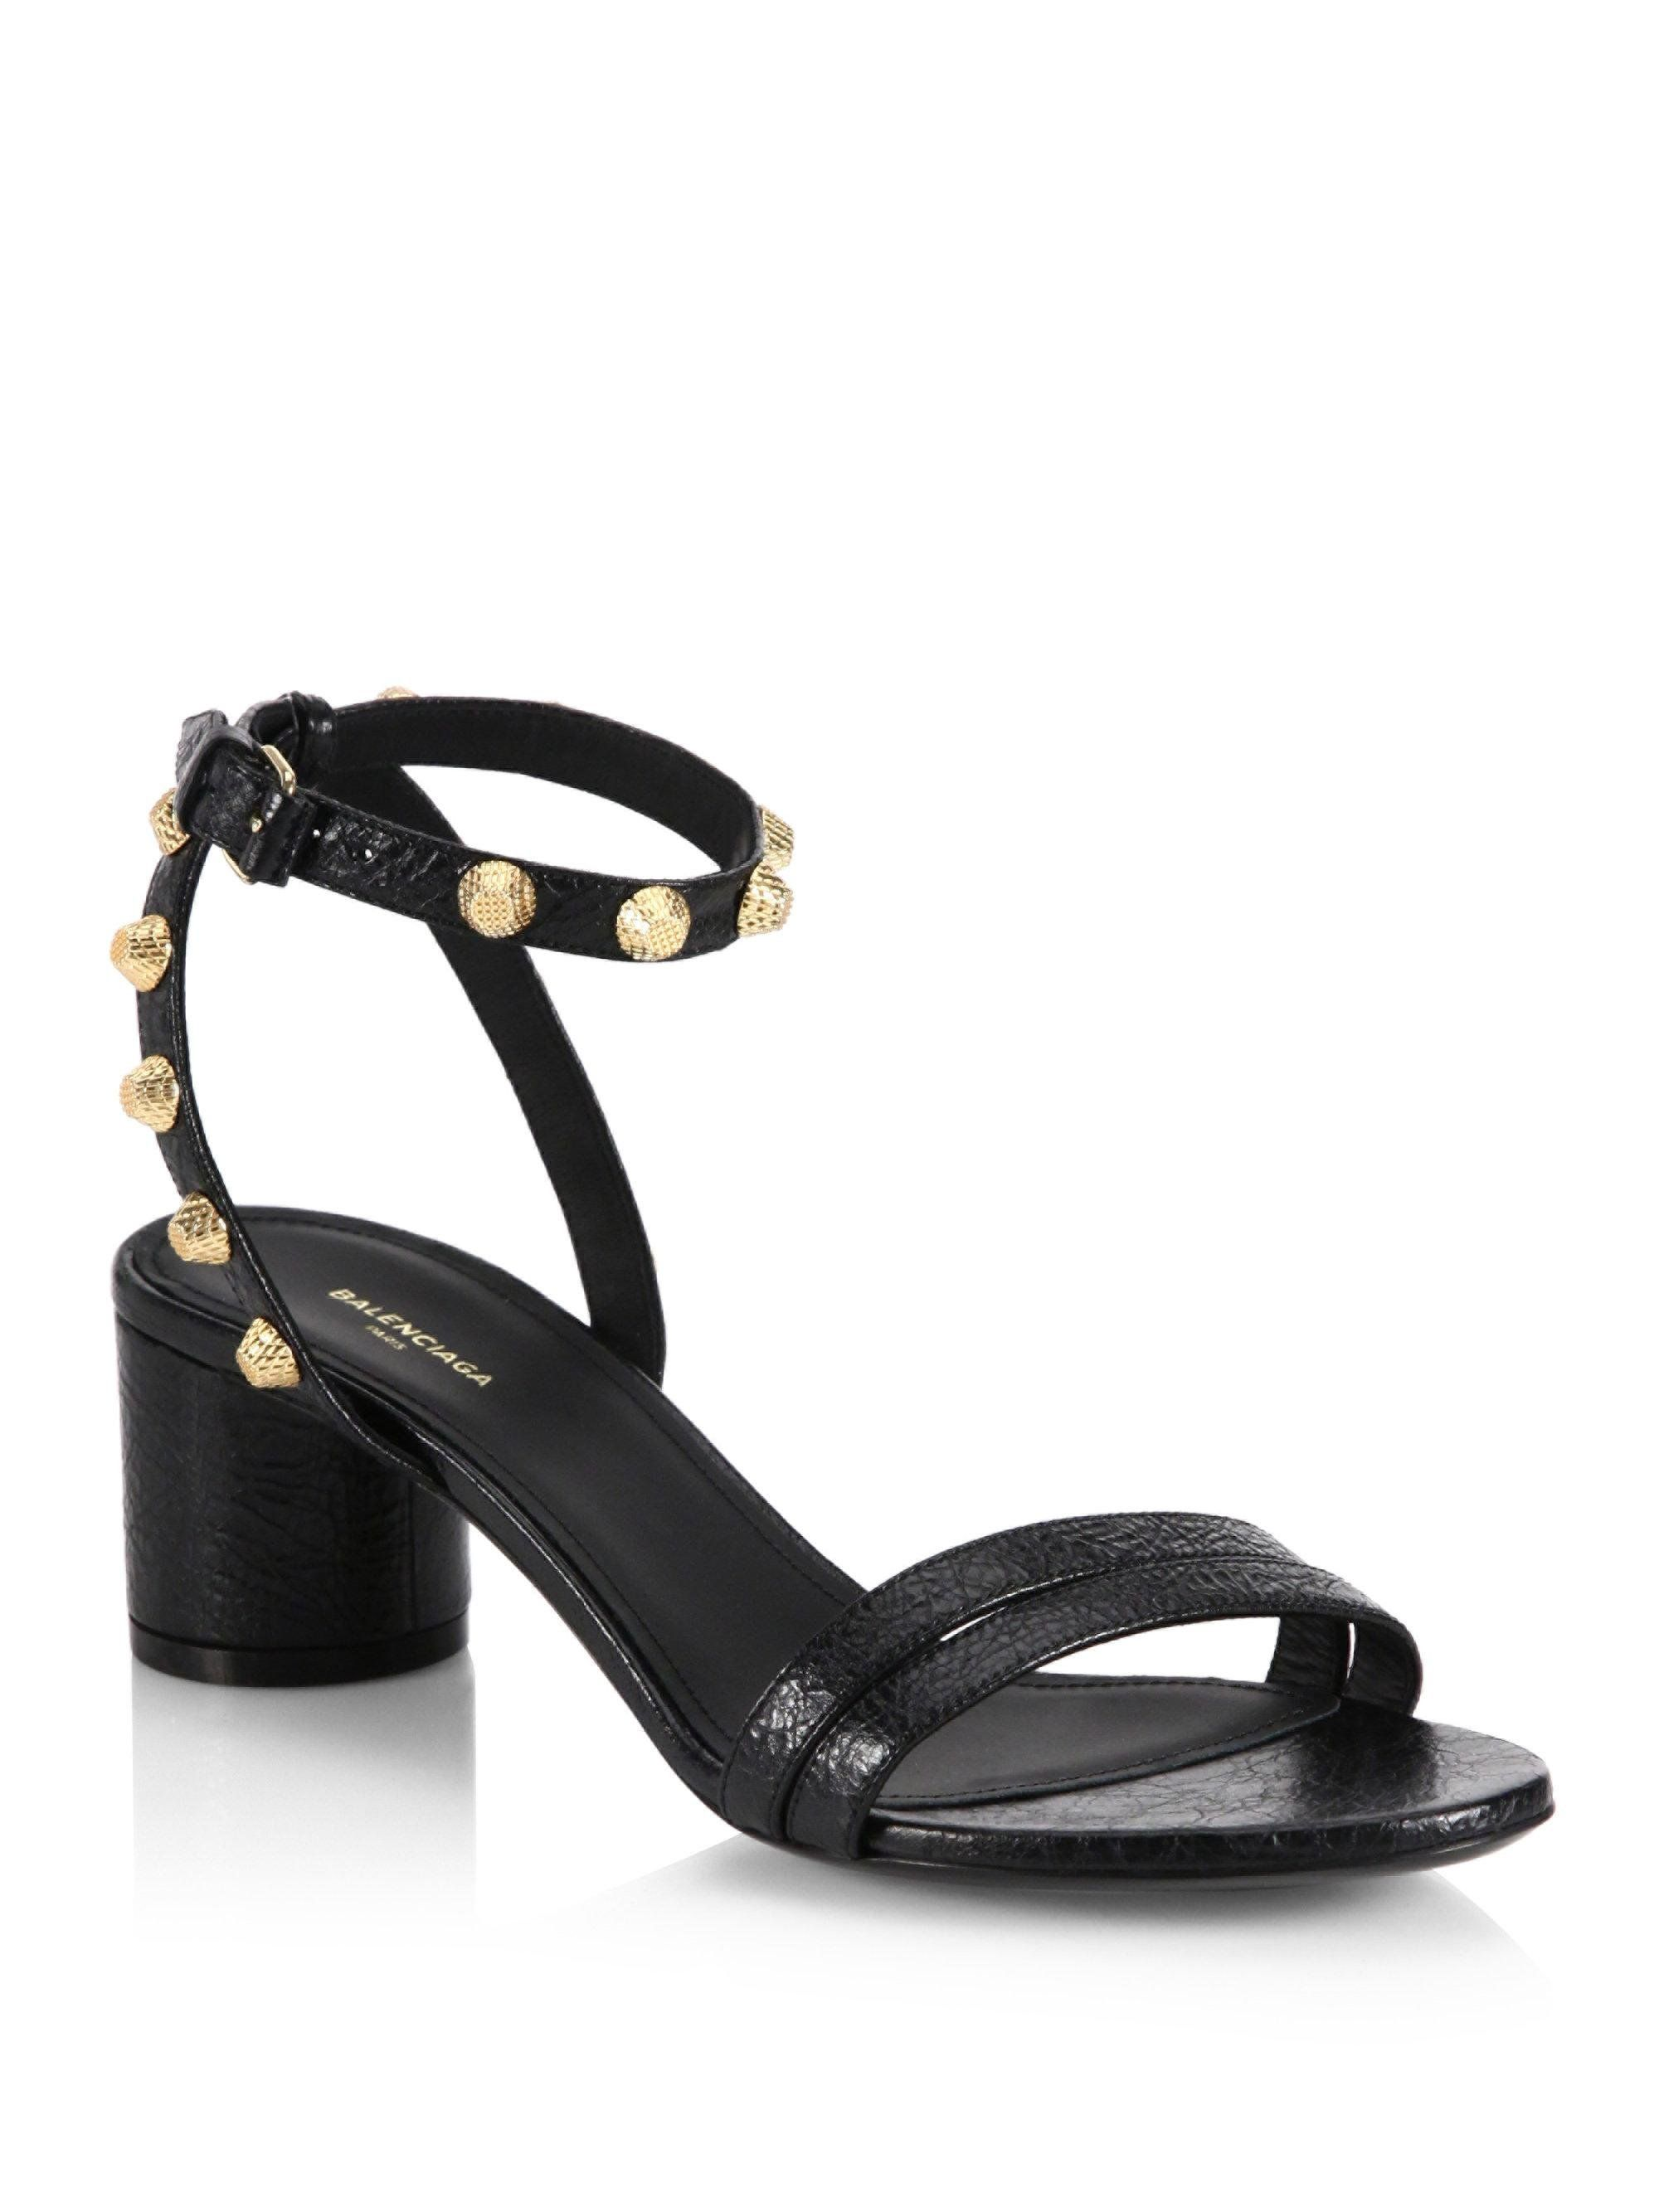 6a5ffdd3344 Balenciaga Leather Block Heel Studded Sandals